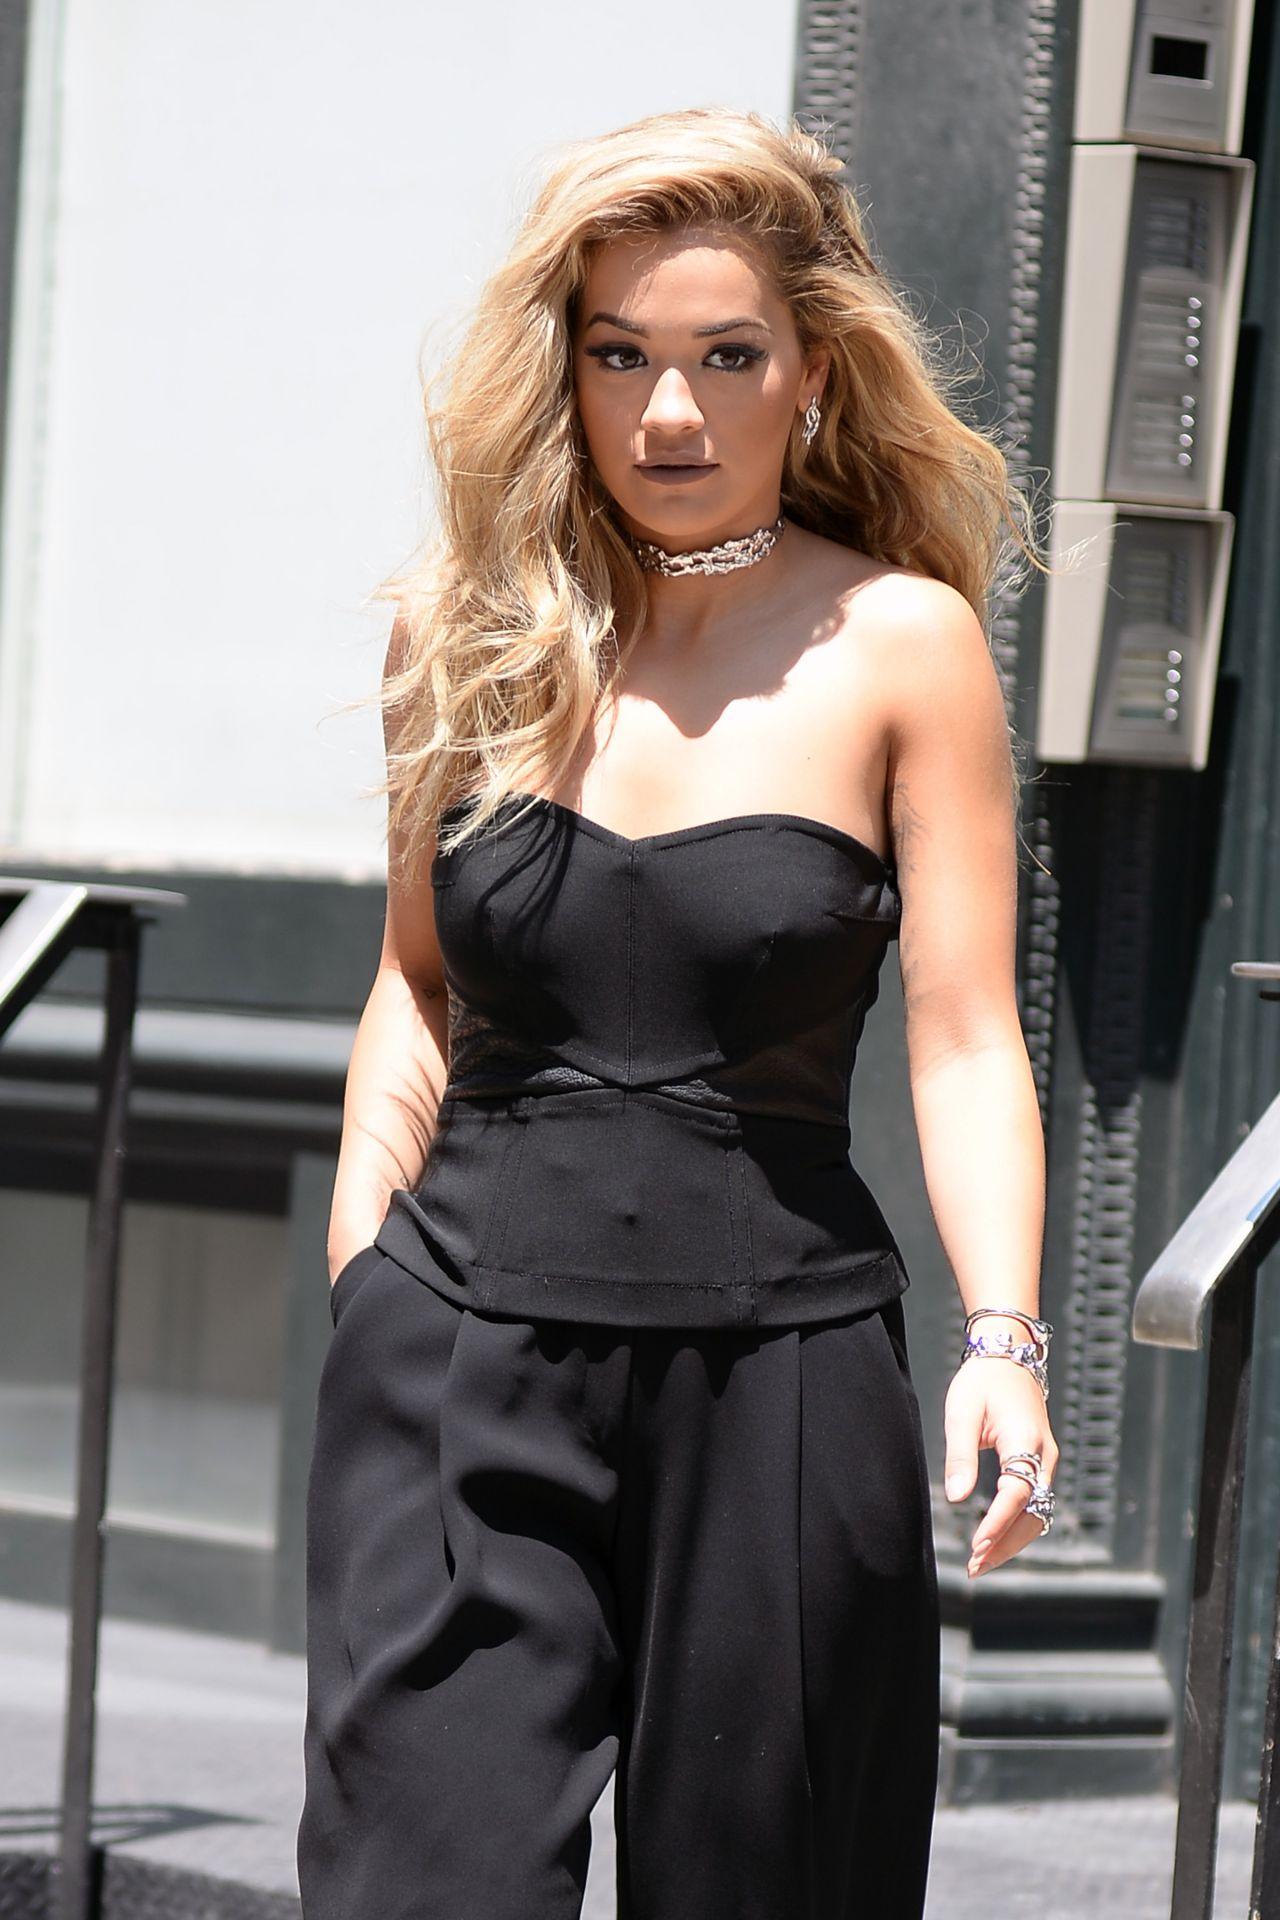 Rita Ora Fashion Shoot Photos: Leaving Her Apartment In New York City 7/25/2016